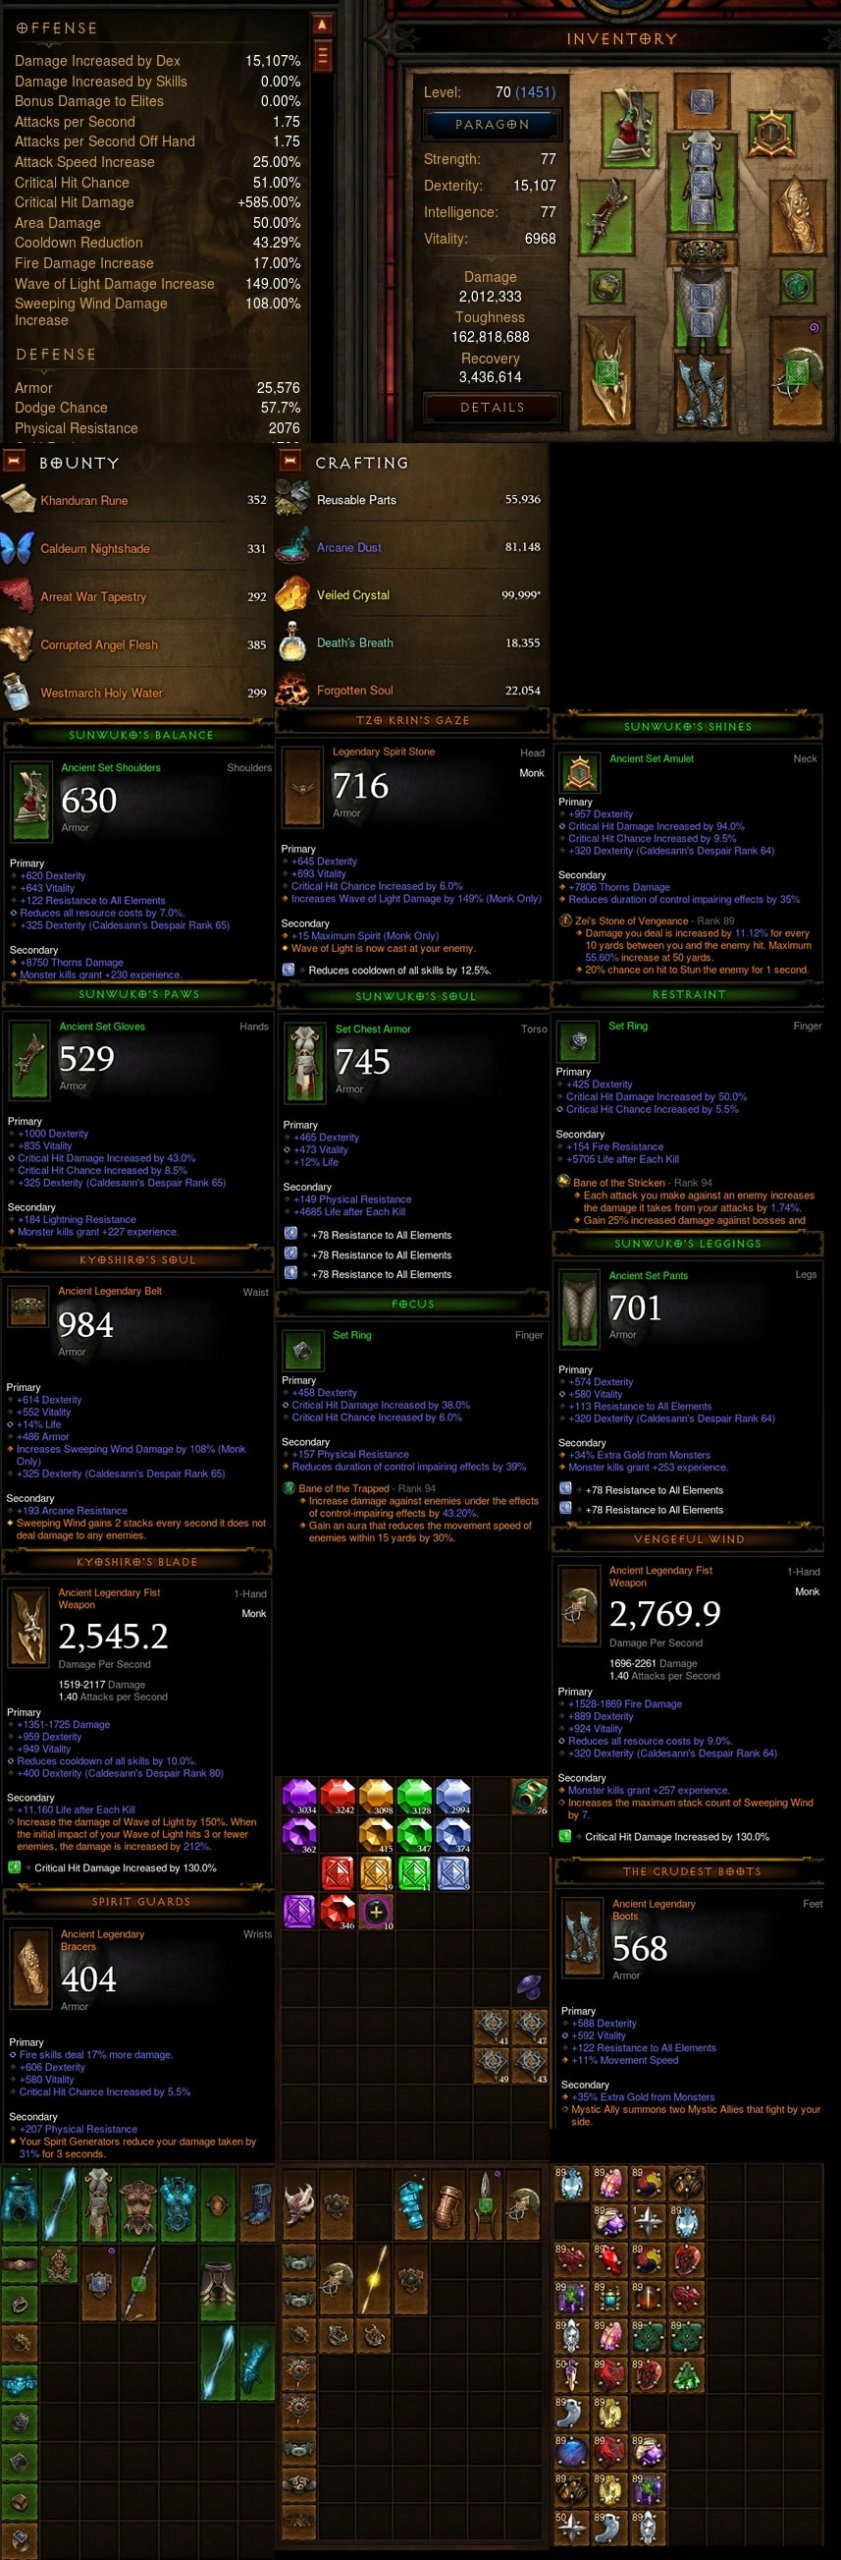 Diablo 3: RoS Konto p 1451 Monk Kosmiczne Skrzydła